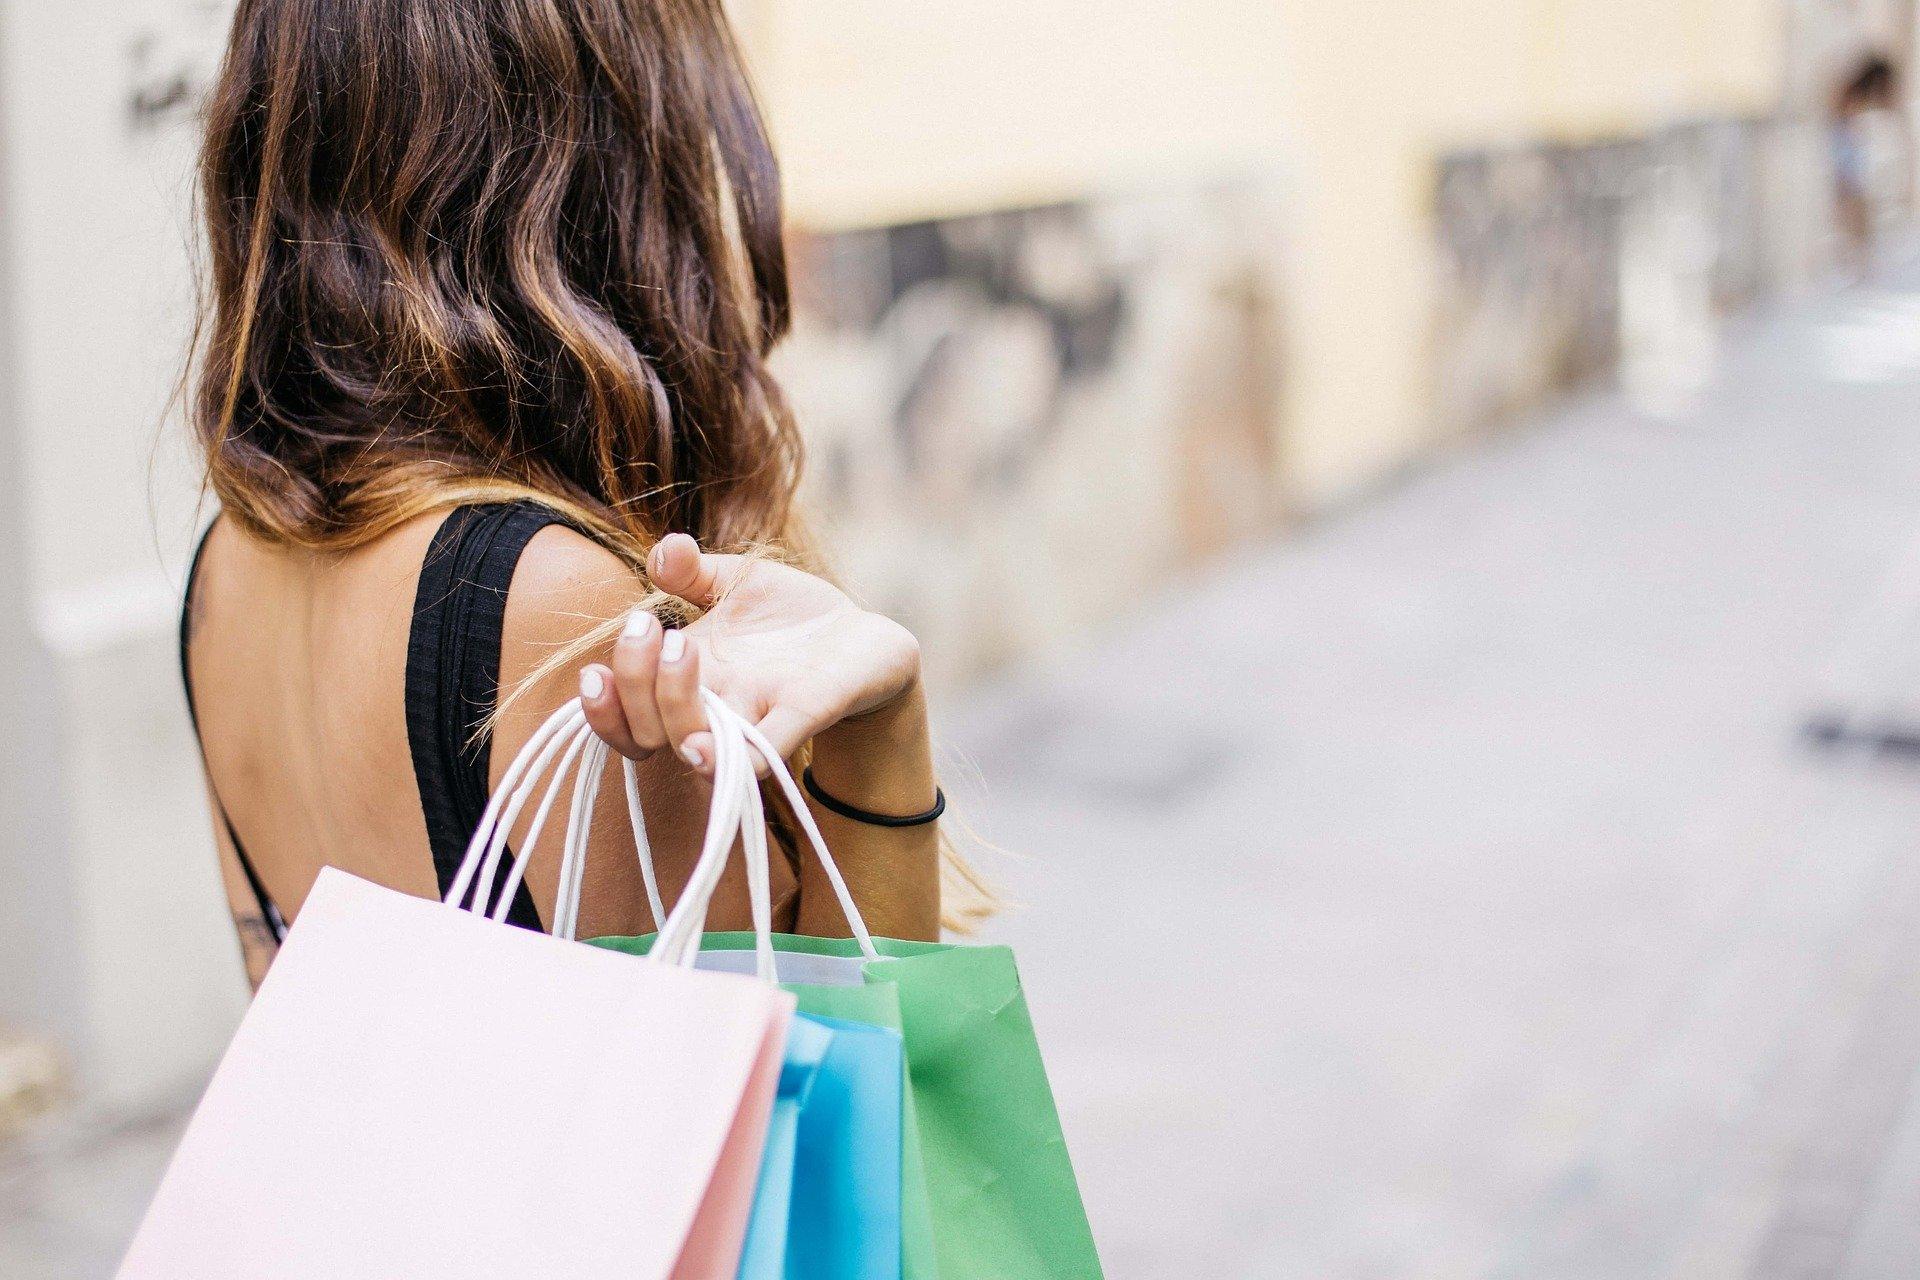 Go shopping - save money